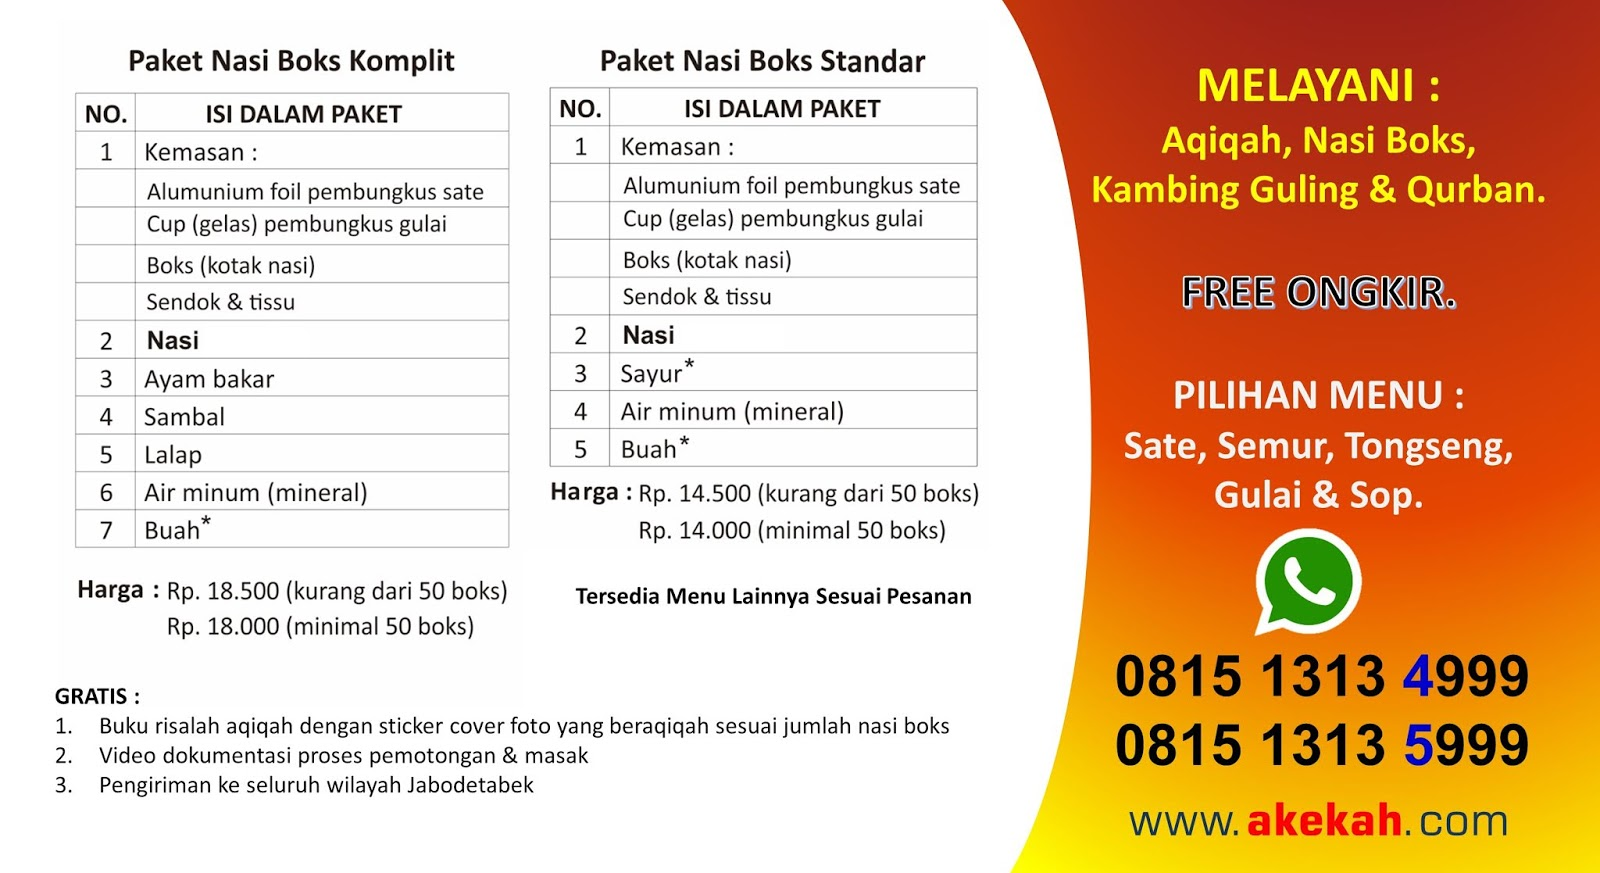 Harga Paket Aqiqah Murah Untuk Laki-Laki Kecamatan Leuwisadeng Kabupaten Bogor